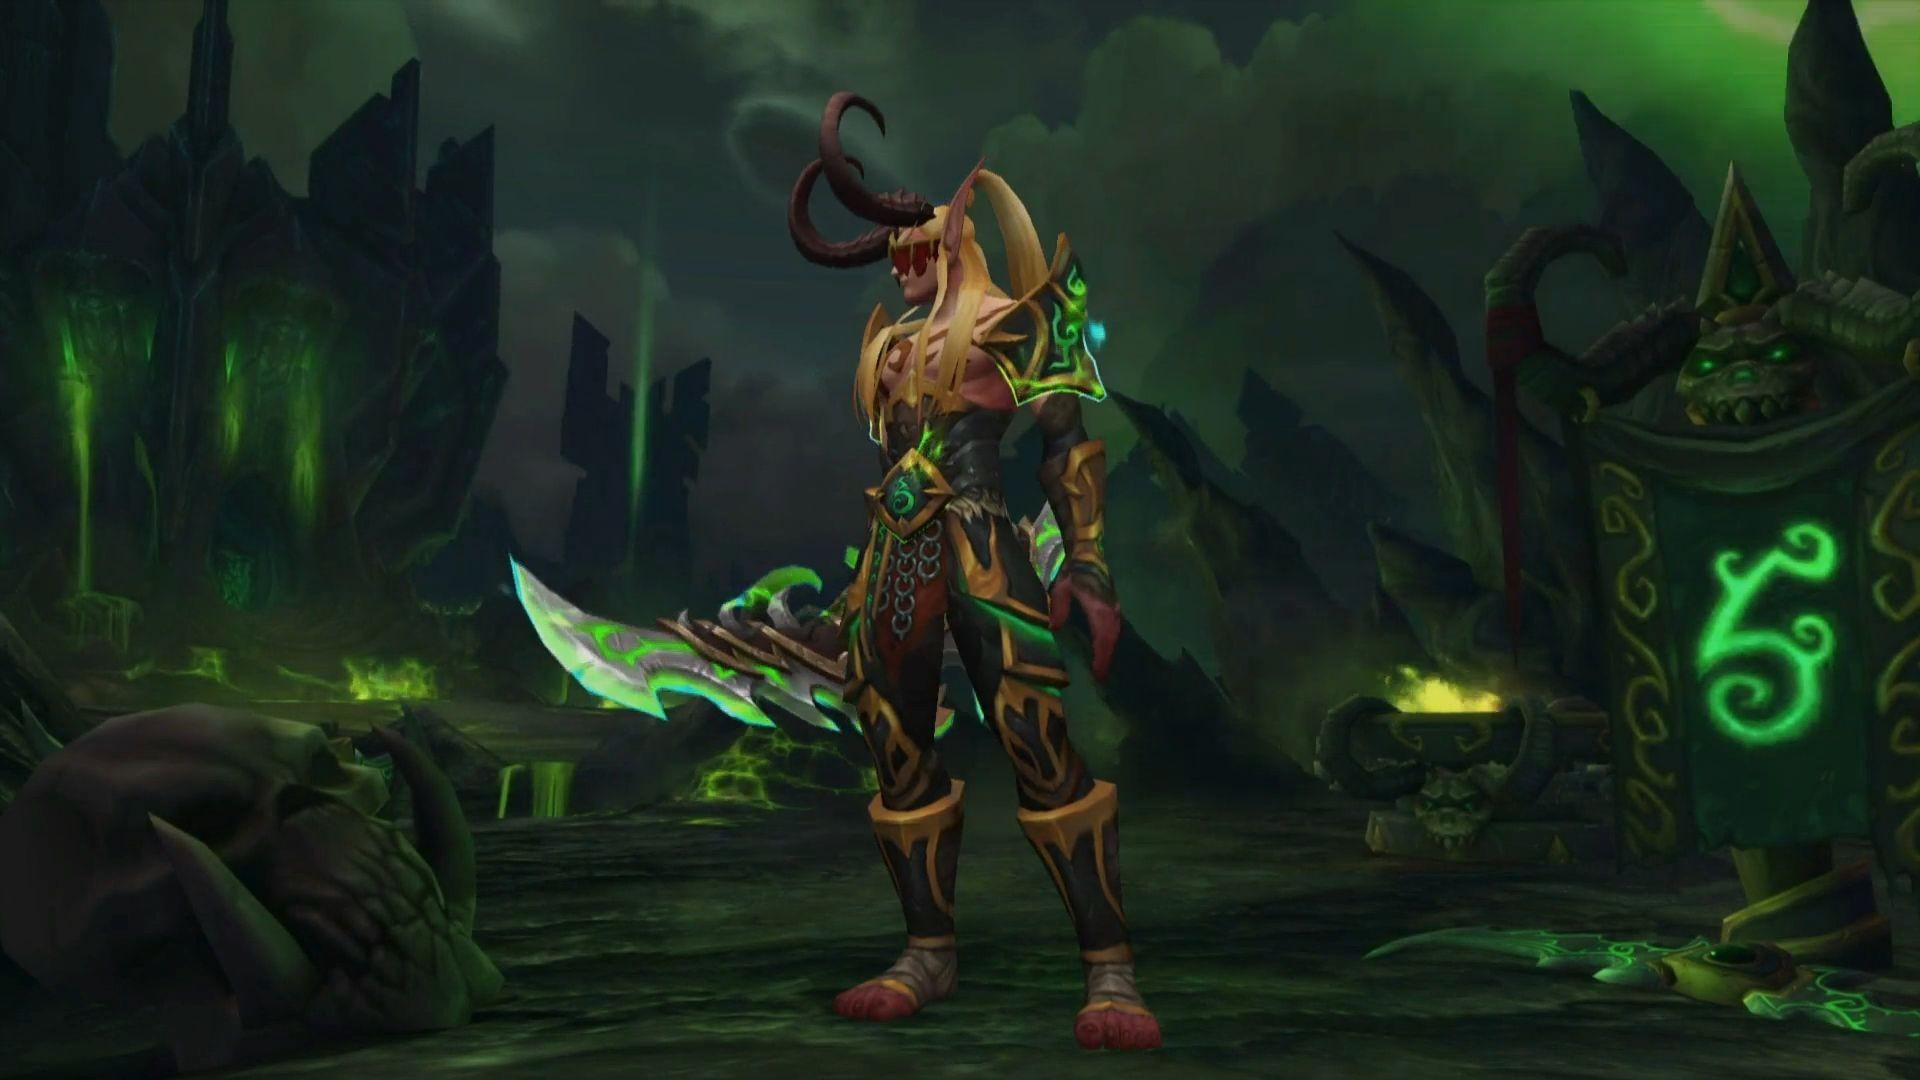 world of warcraft legion   world of warcraft   Pinterest   Warcraft legion  and Warcraft art